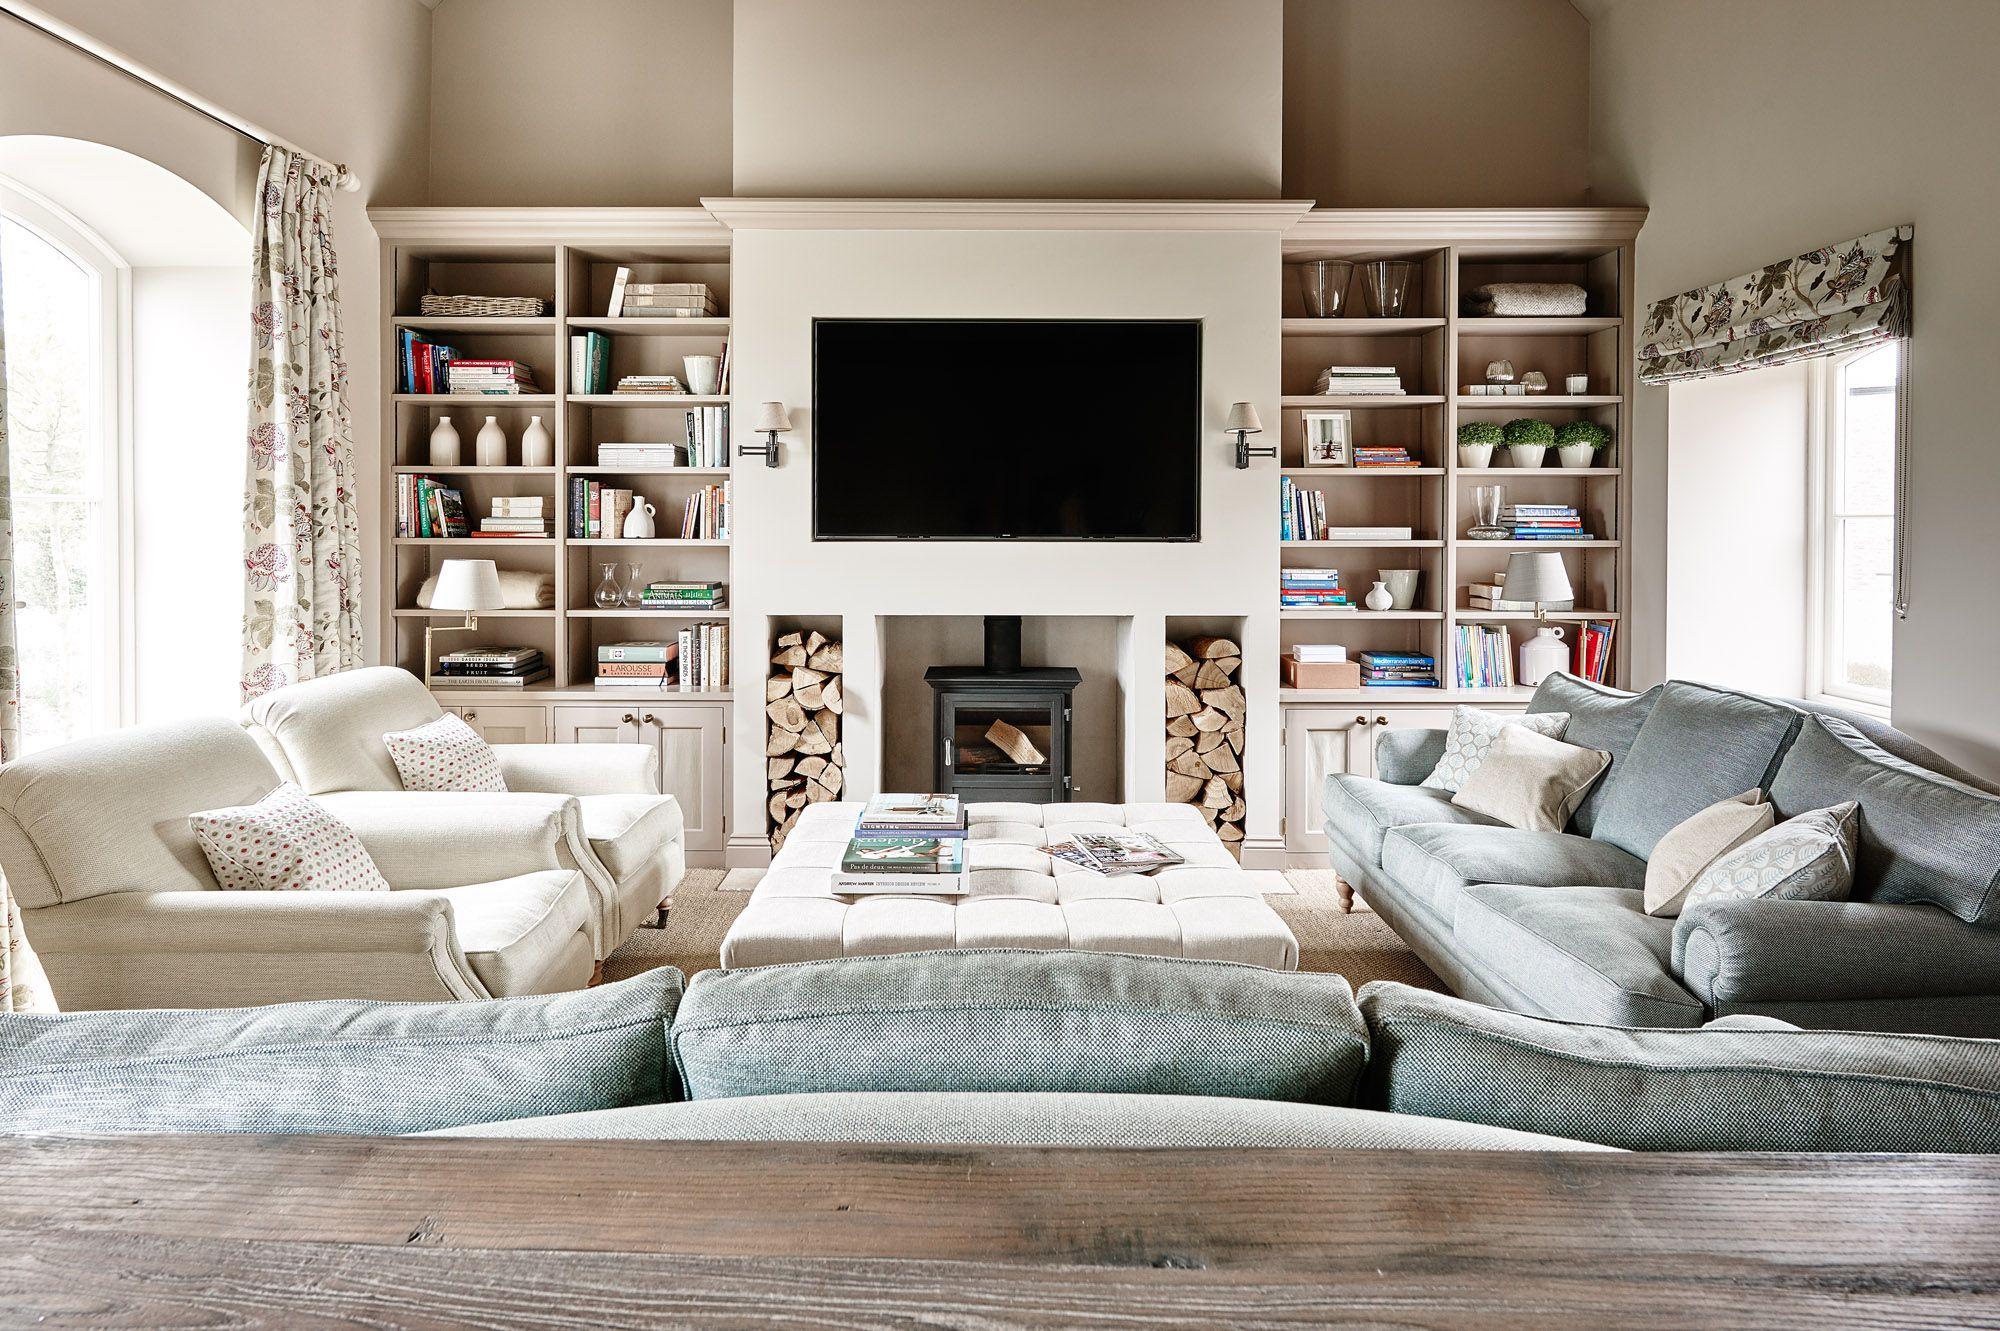 Wood Stove Built Into Fireplace Log Burner Living Room Farm